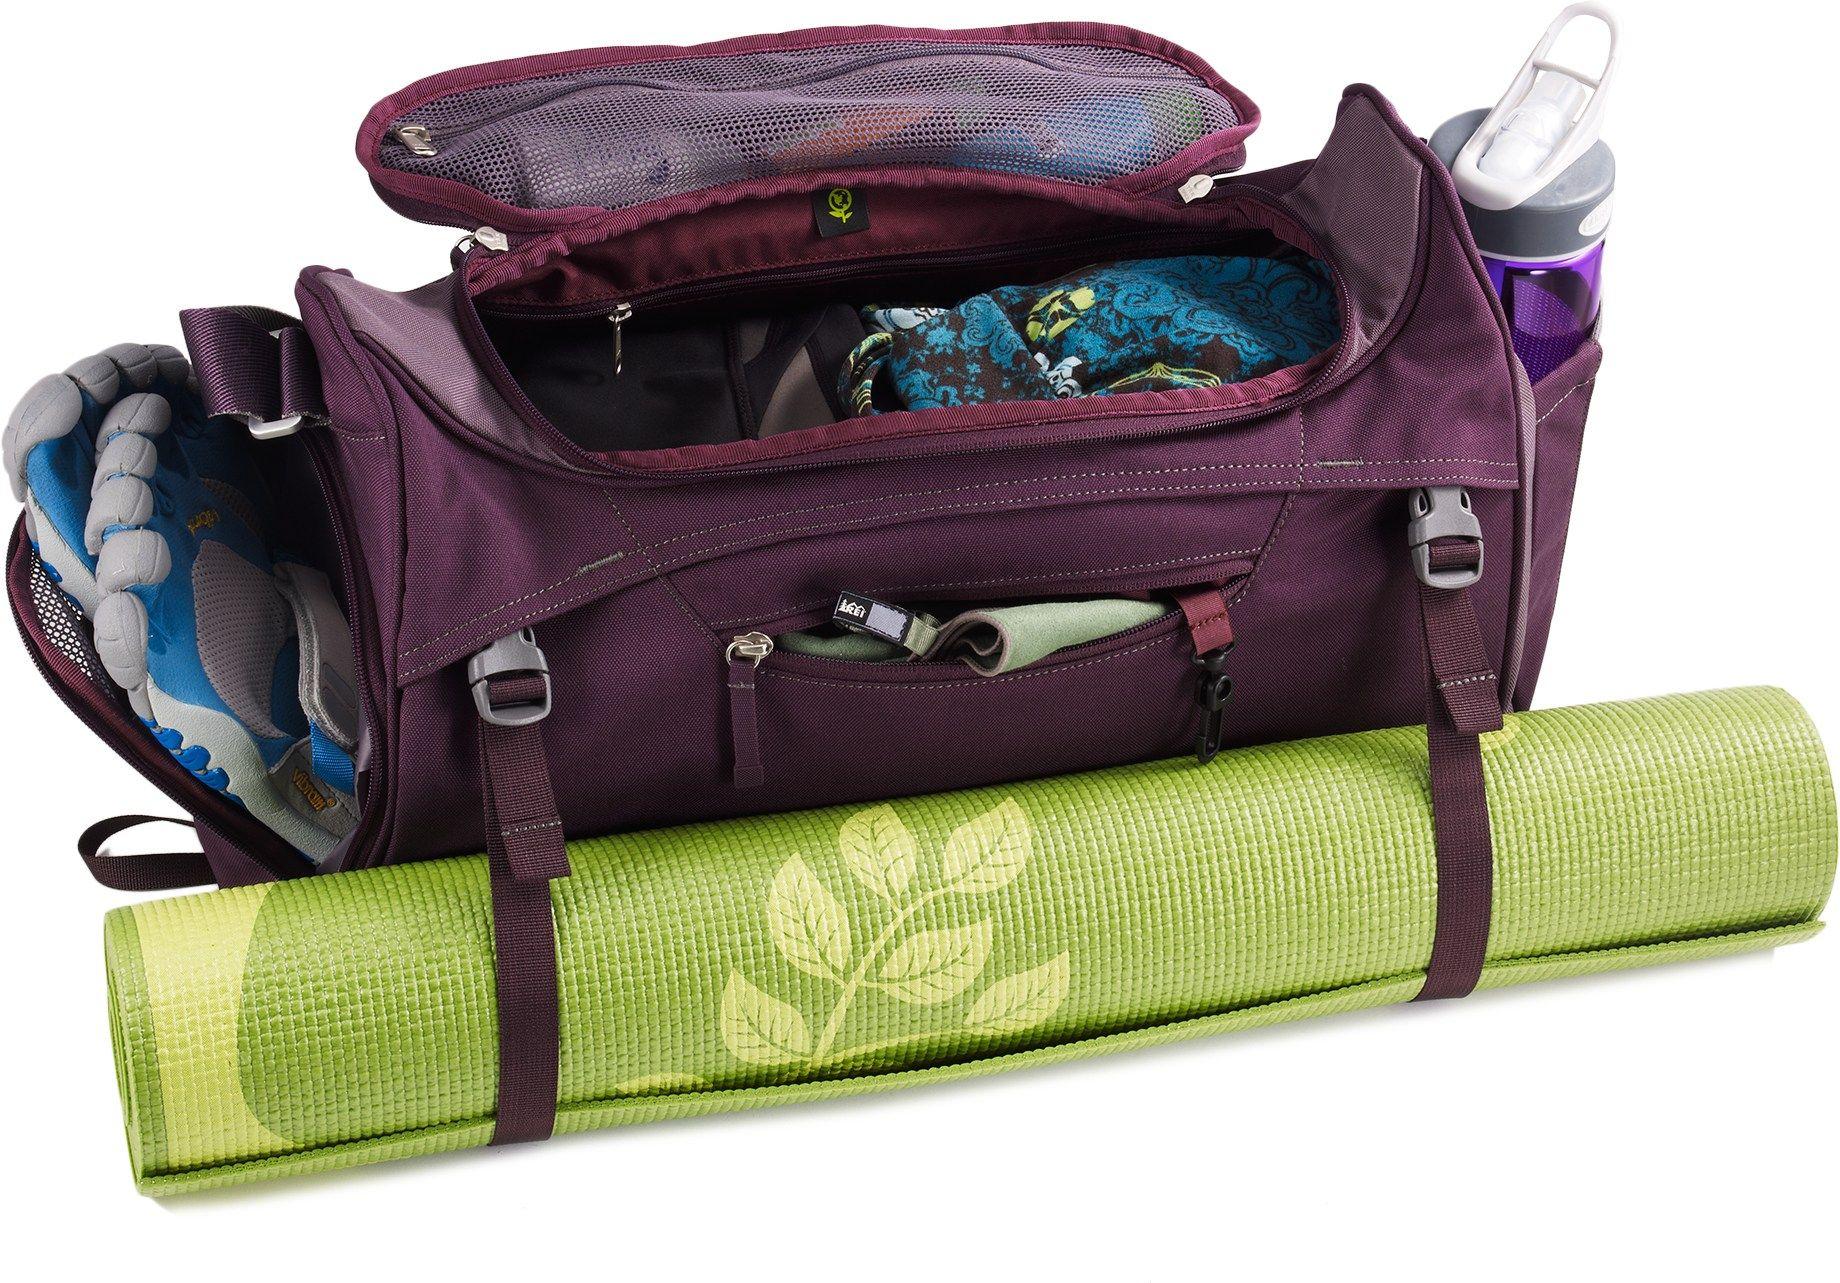 REI Balance Gym Bag - Women s - Special Buy at REI-OUTLET.com ... 4edcd187b749d